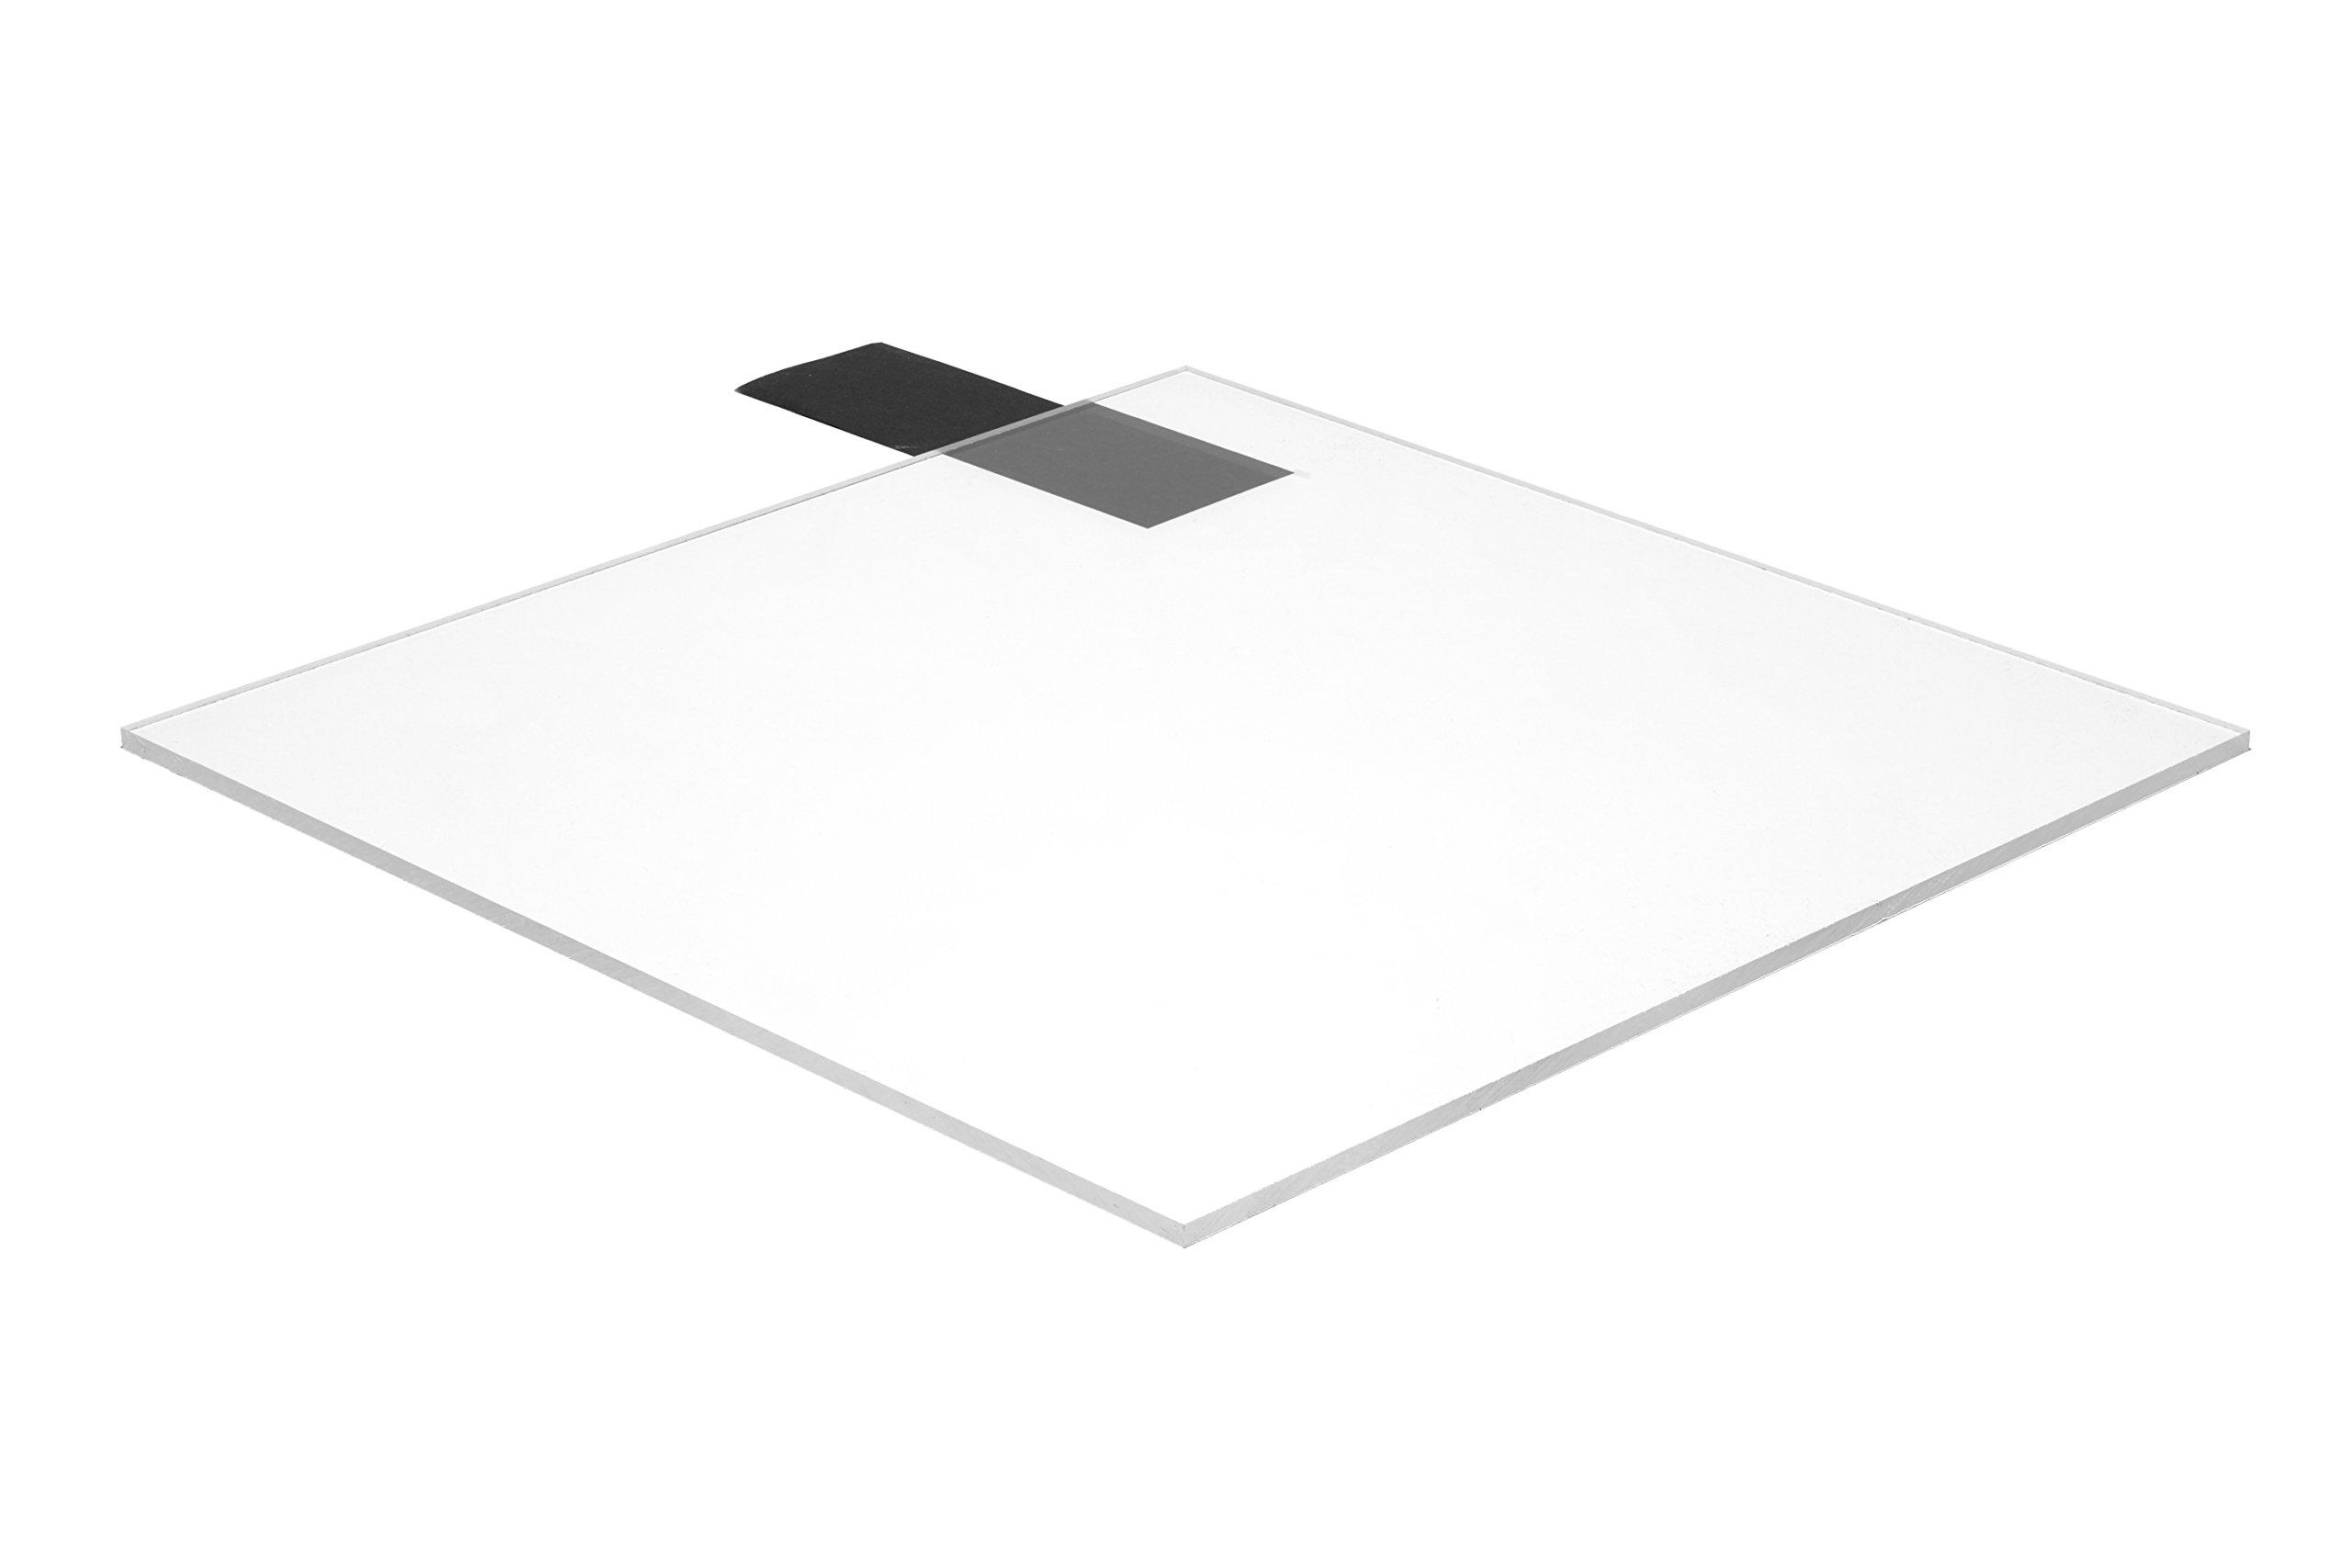 Falken Design CL1-2/1236 Acrylic Clear Sheet, 12'' x 36'', 1/2'' Thick by Falken Design Corporation